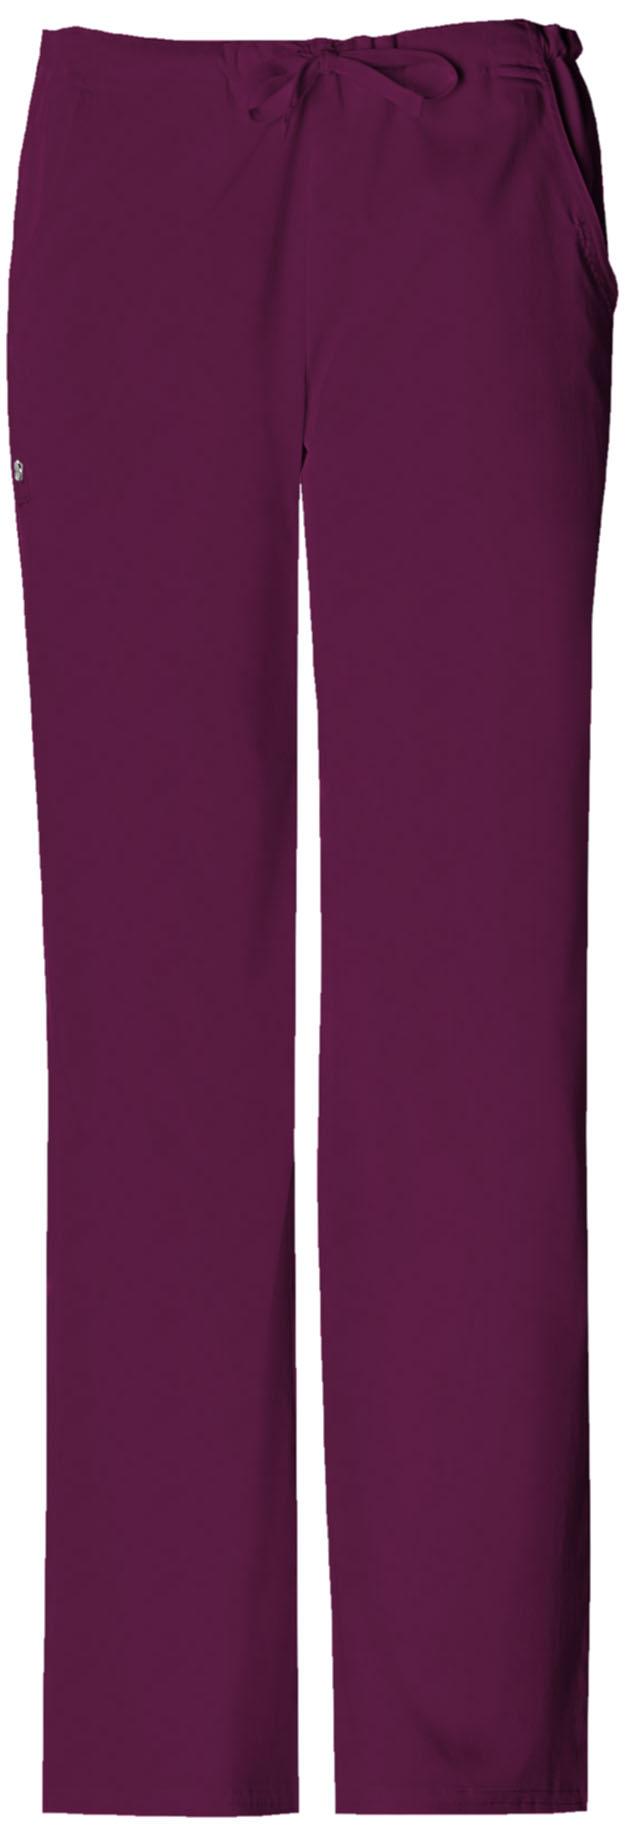 Cherokee Low Rise Drawstring Pant 1066P - Petite